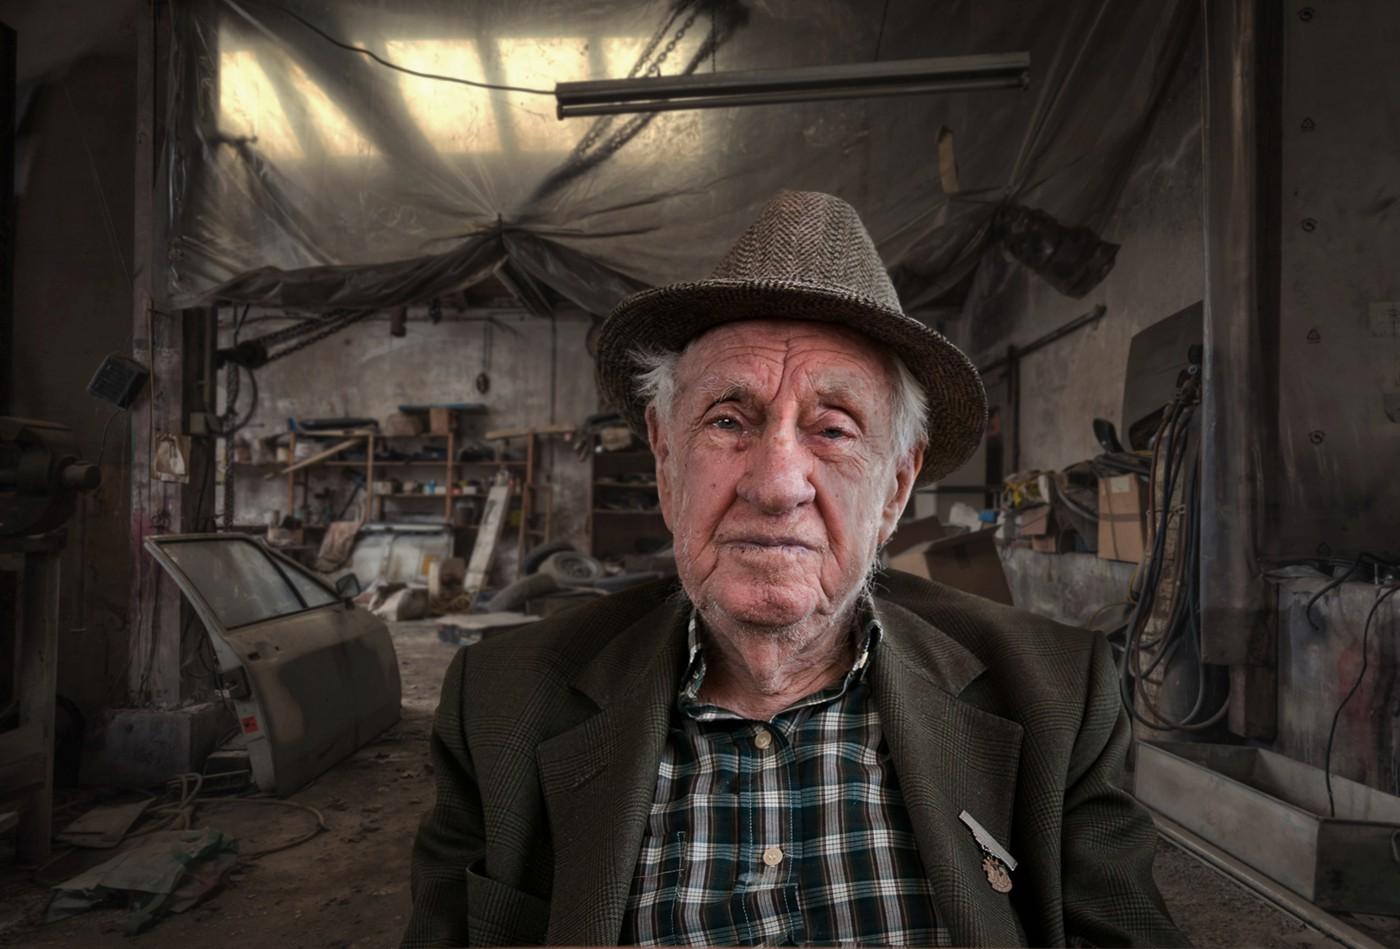 Oude man in garage